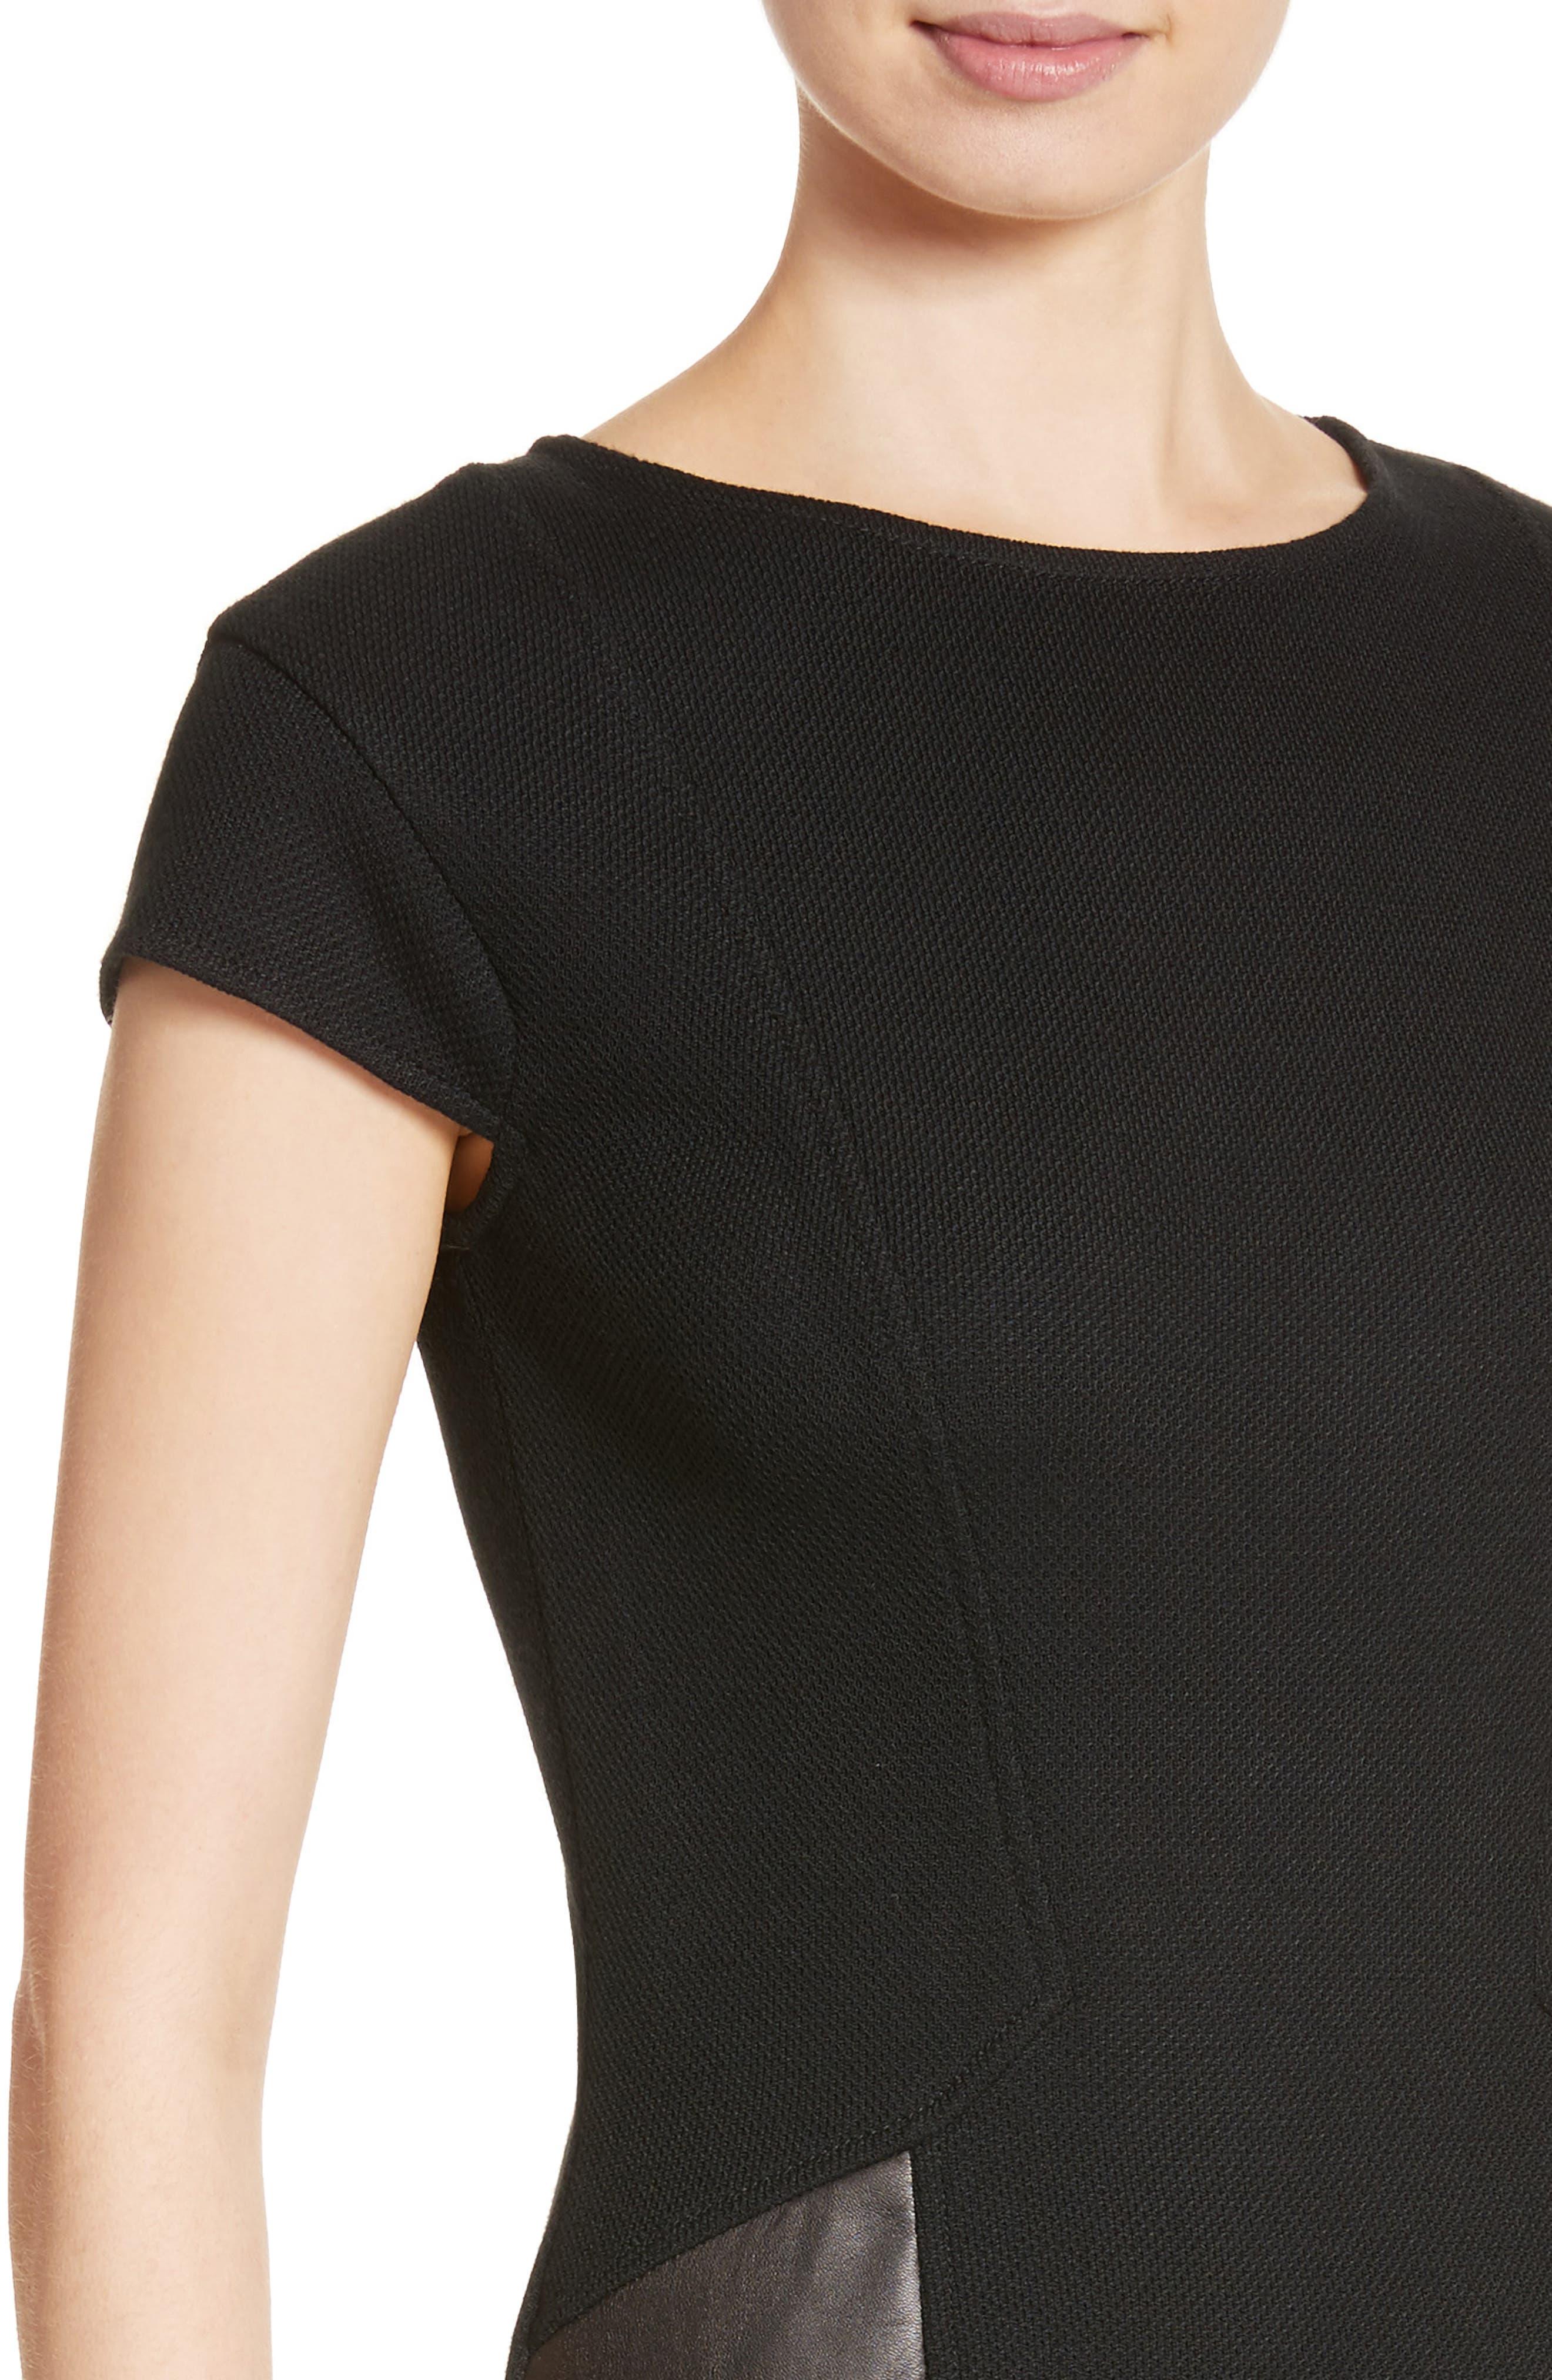 Leather Panel Milano Piqué Knit Dress,                             Alternate thumbnail 4, color,                             001